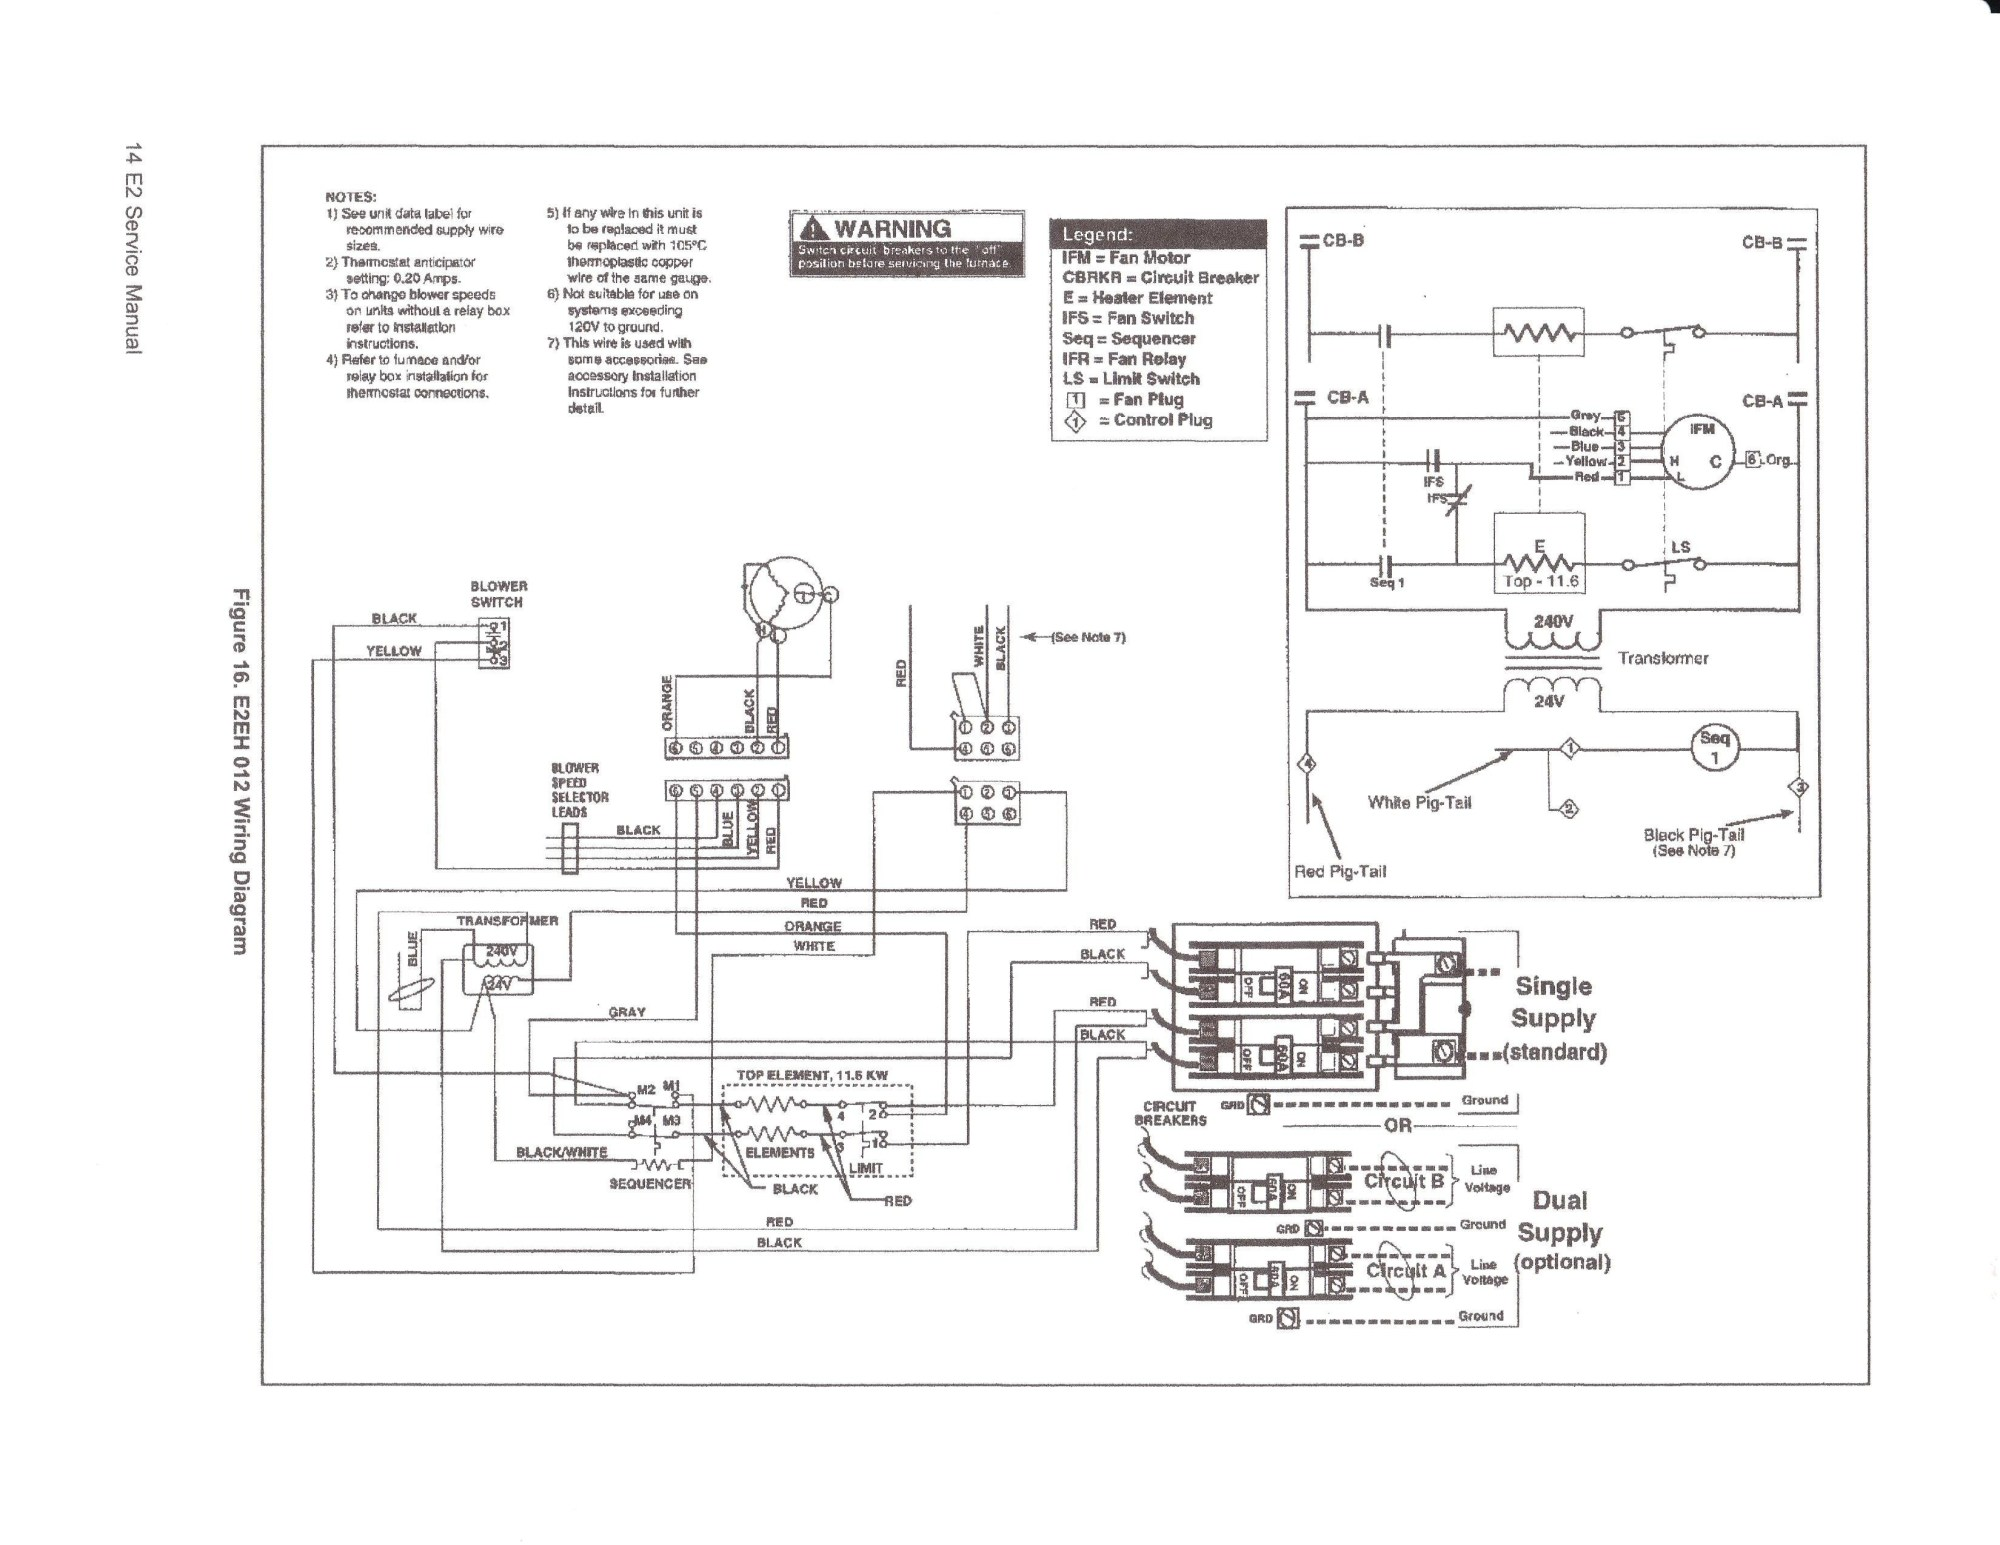 hight resolution of coleman evcon eb17b transformer diagram wiring schematic diagramcoleman evcon eb17b transformer diagram data wiring diagram today